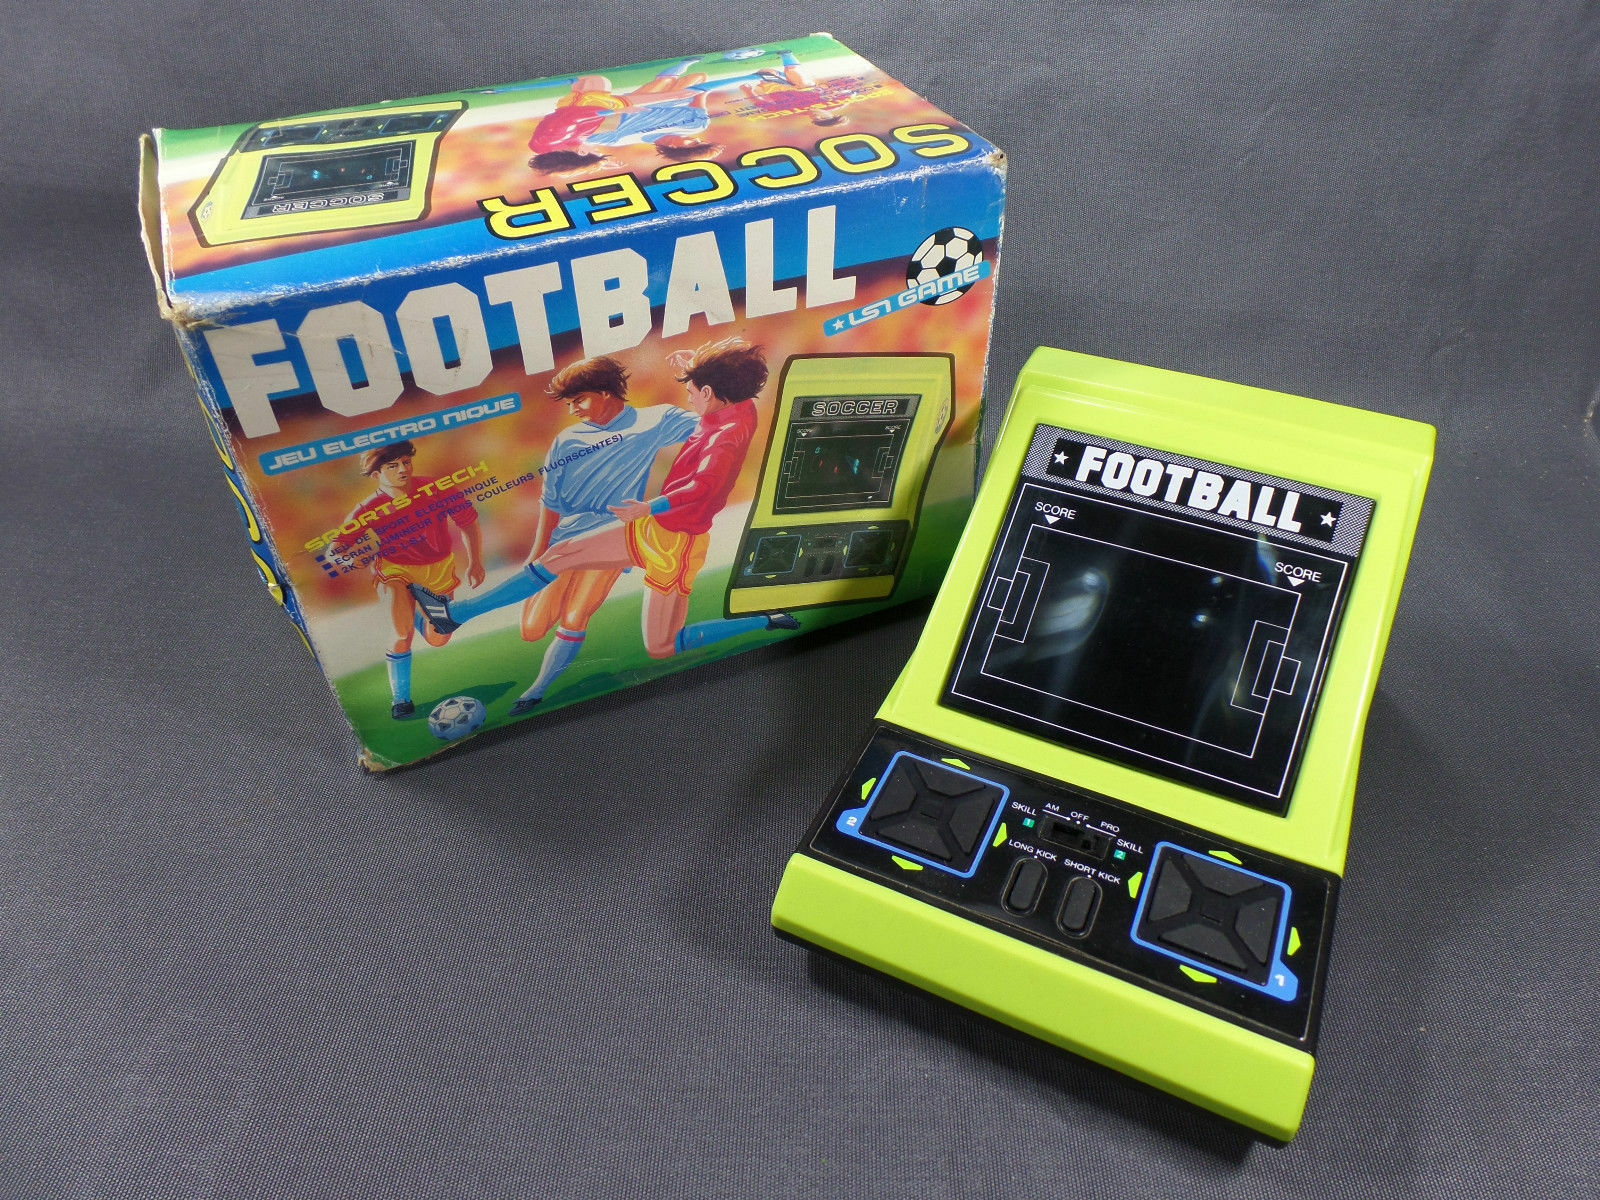 Soccer football mint condition styrofoam box shims